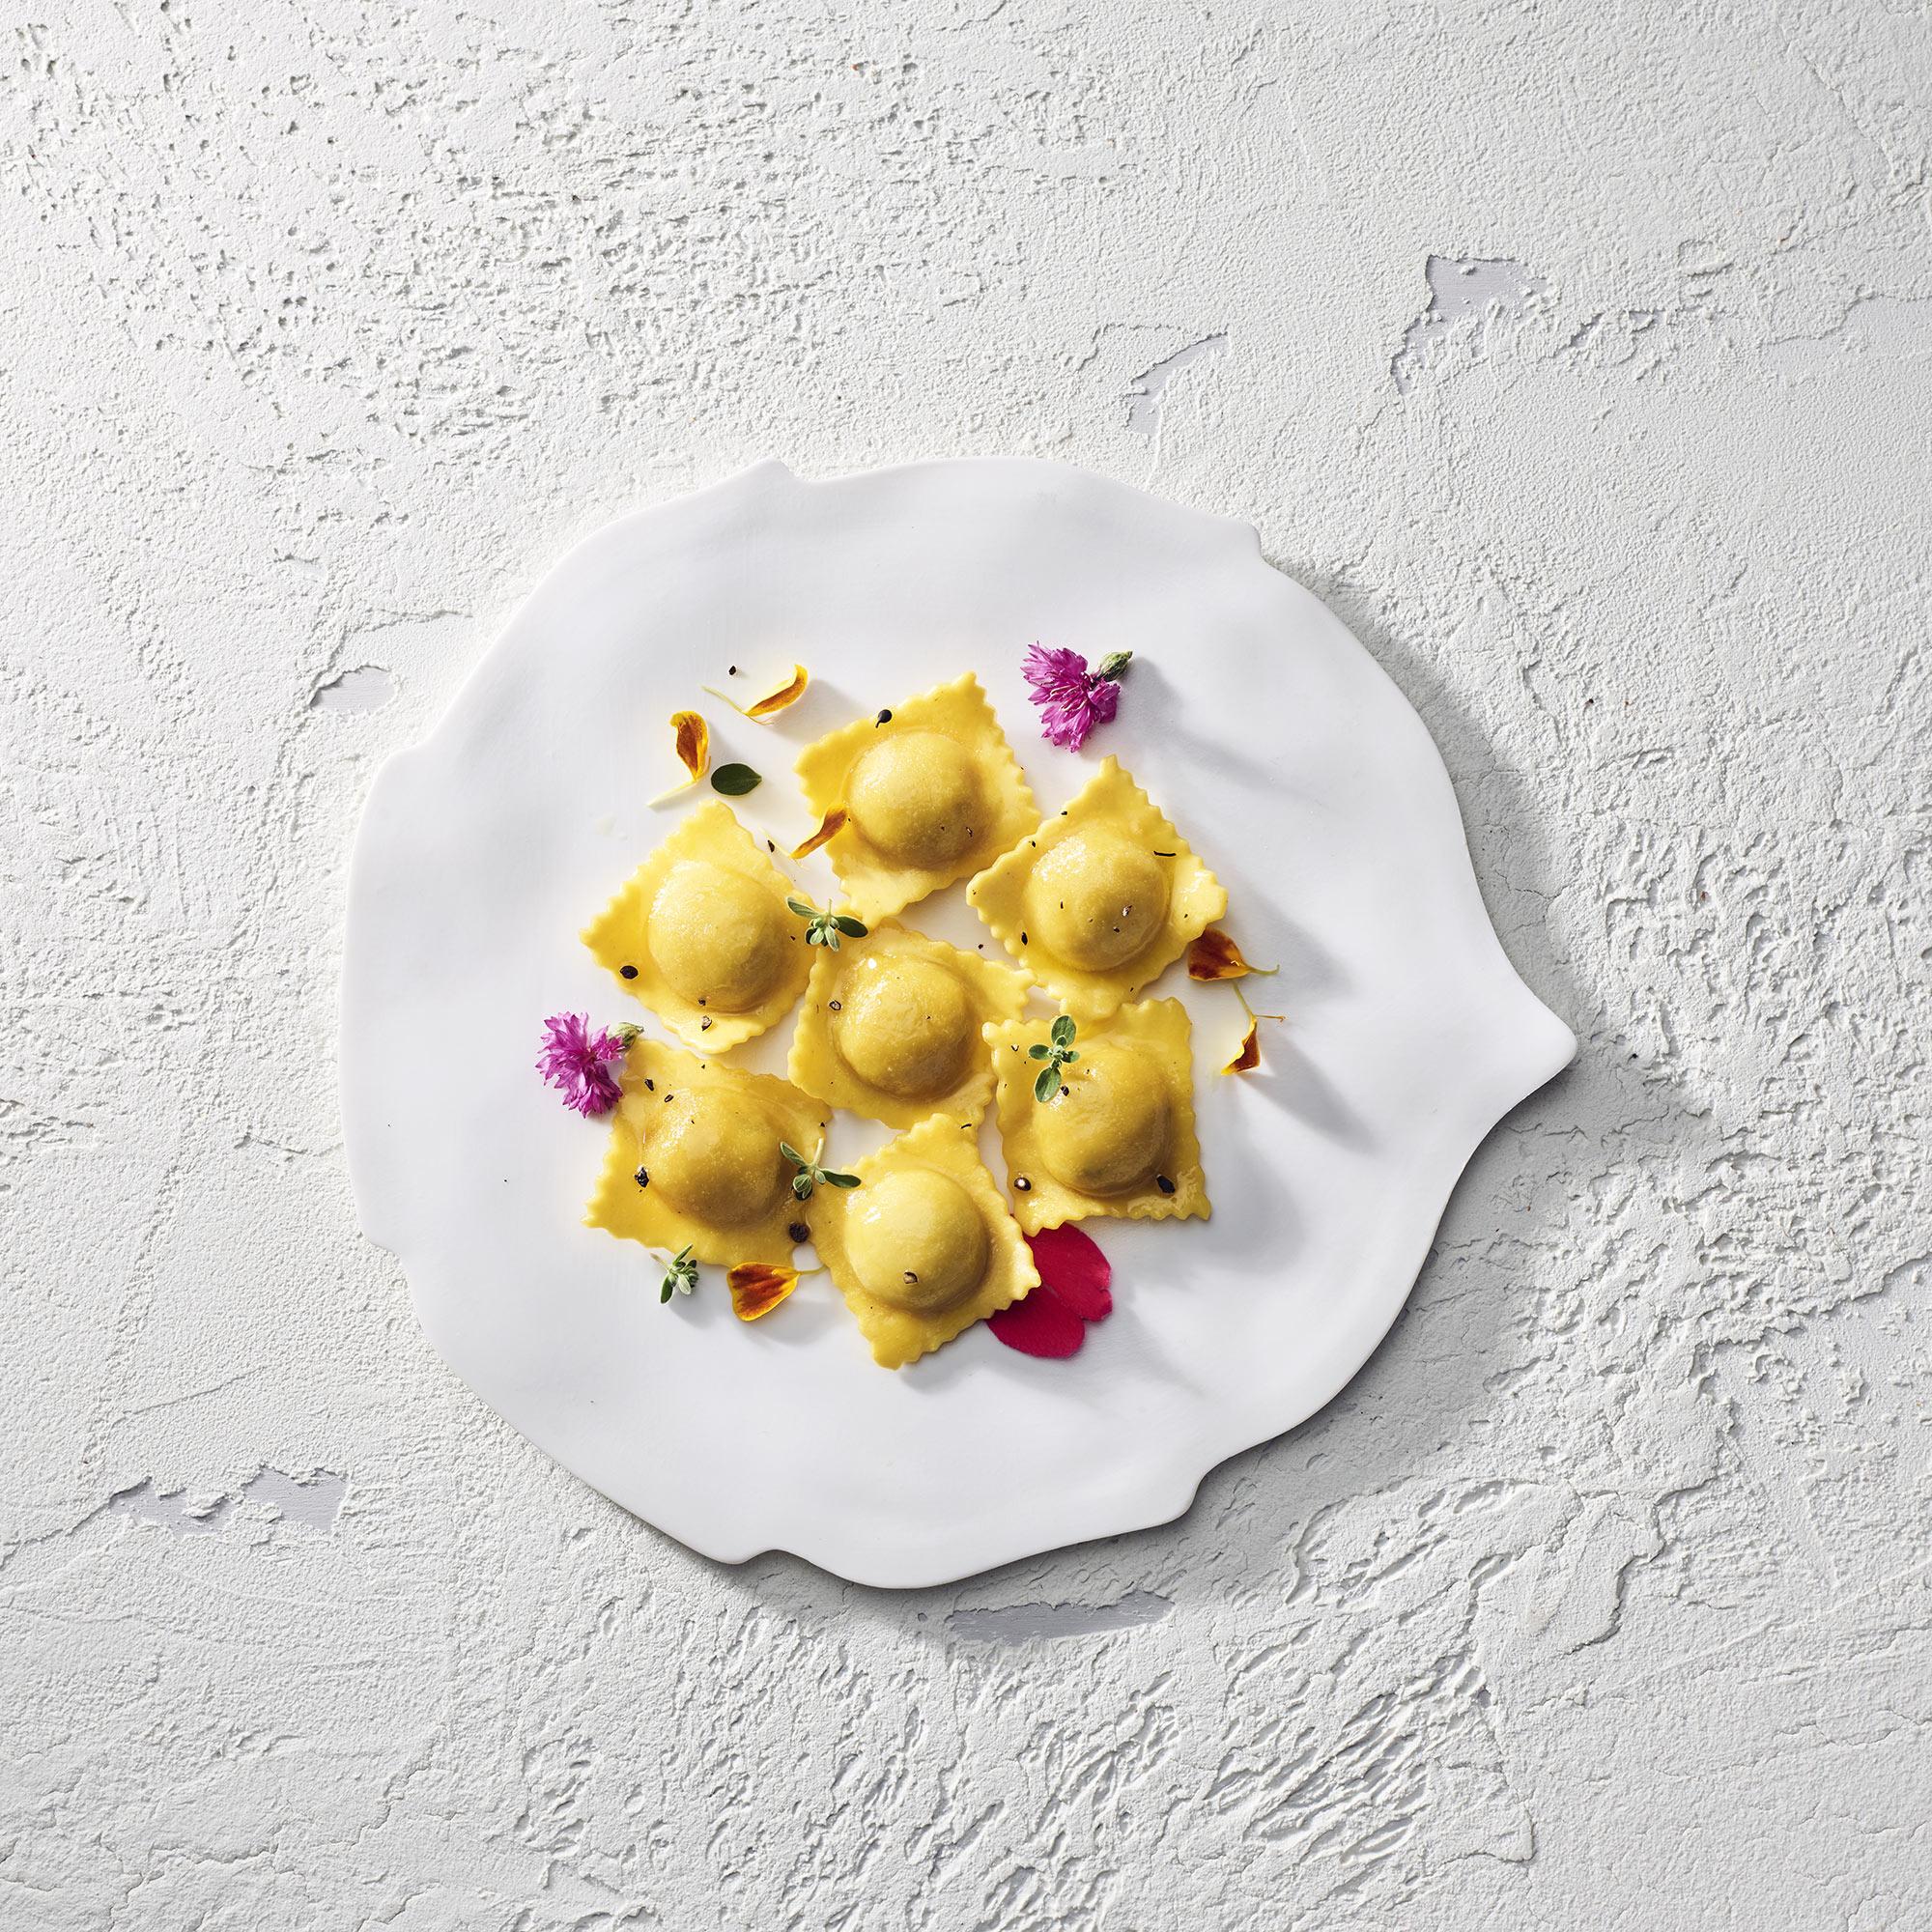 Irinox Piatto Ravioli Tortellini Food Shot by Fotografando